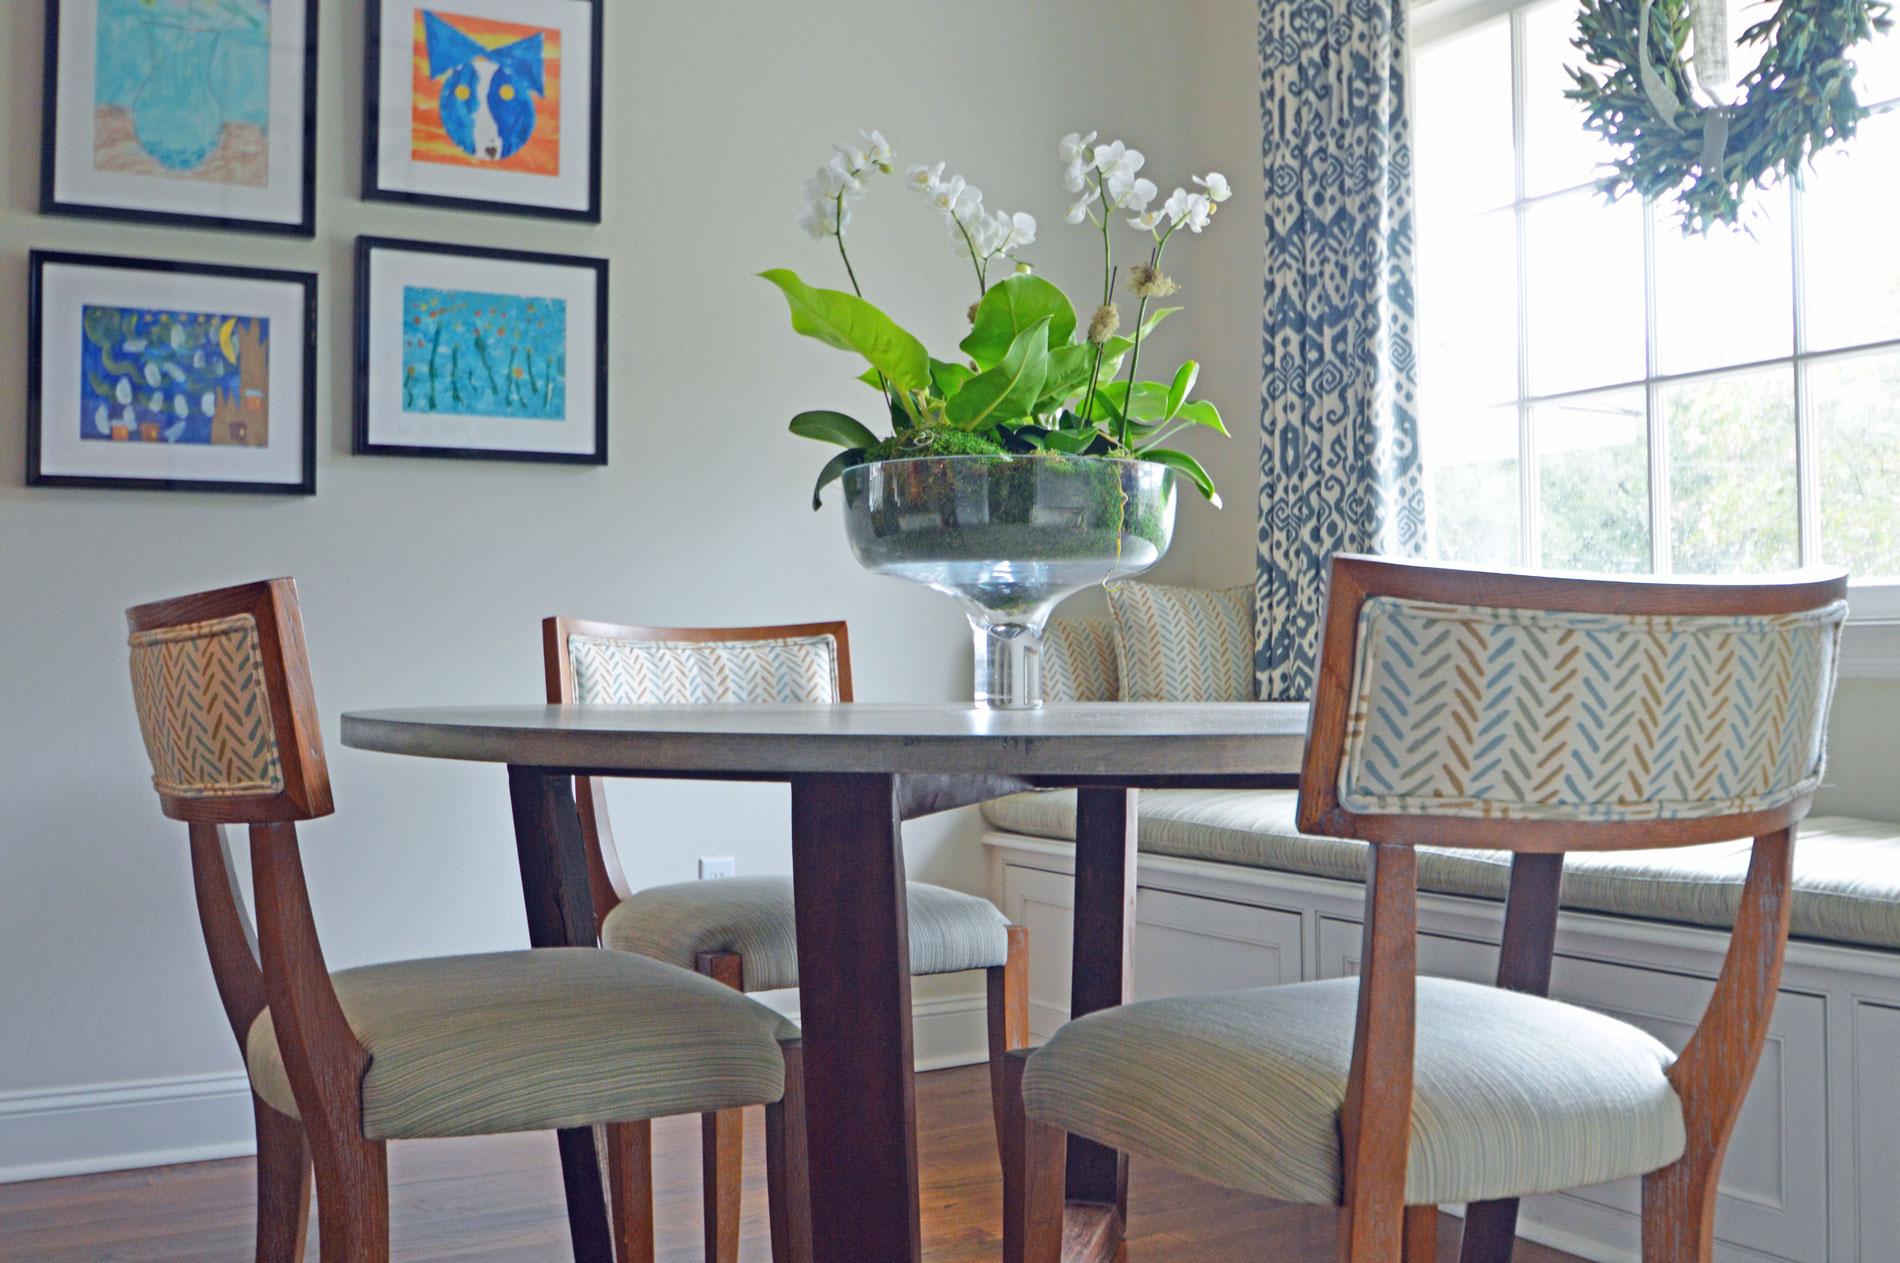 fawley-david2-dixon-smith-interiors-baton-rouge-interior-design-custom-furniture-web-0017